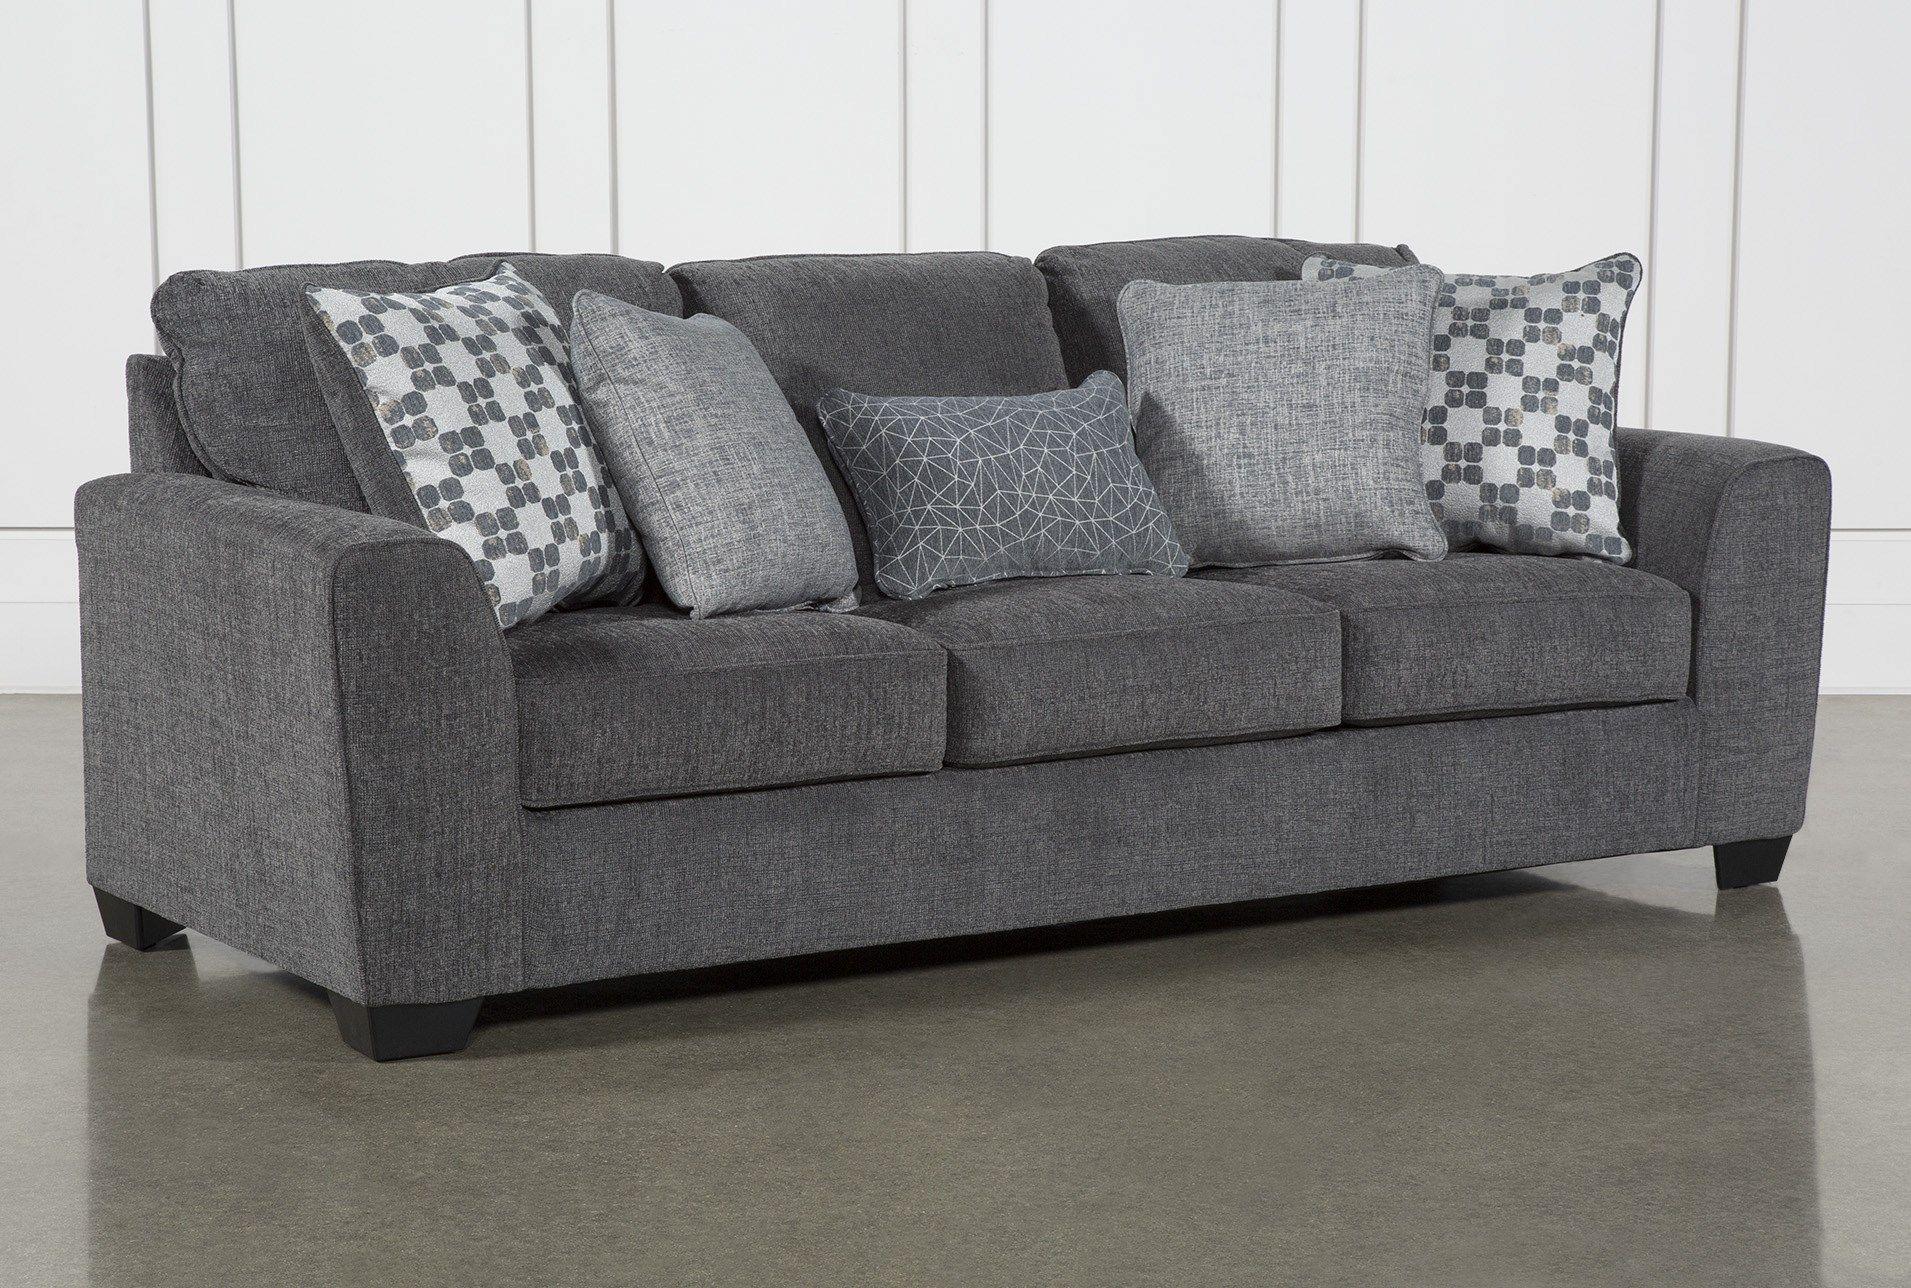 Ashley Banks Queen Sofa Sleeper Grey Sofa Bed 795 Queen